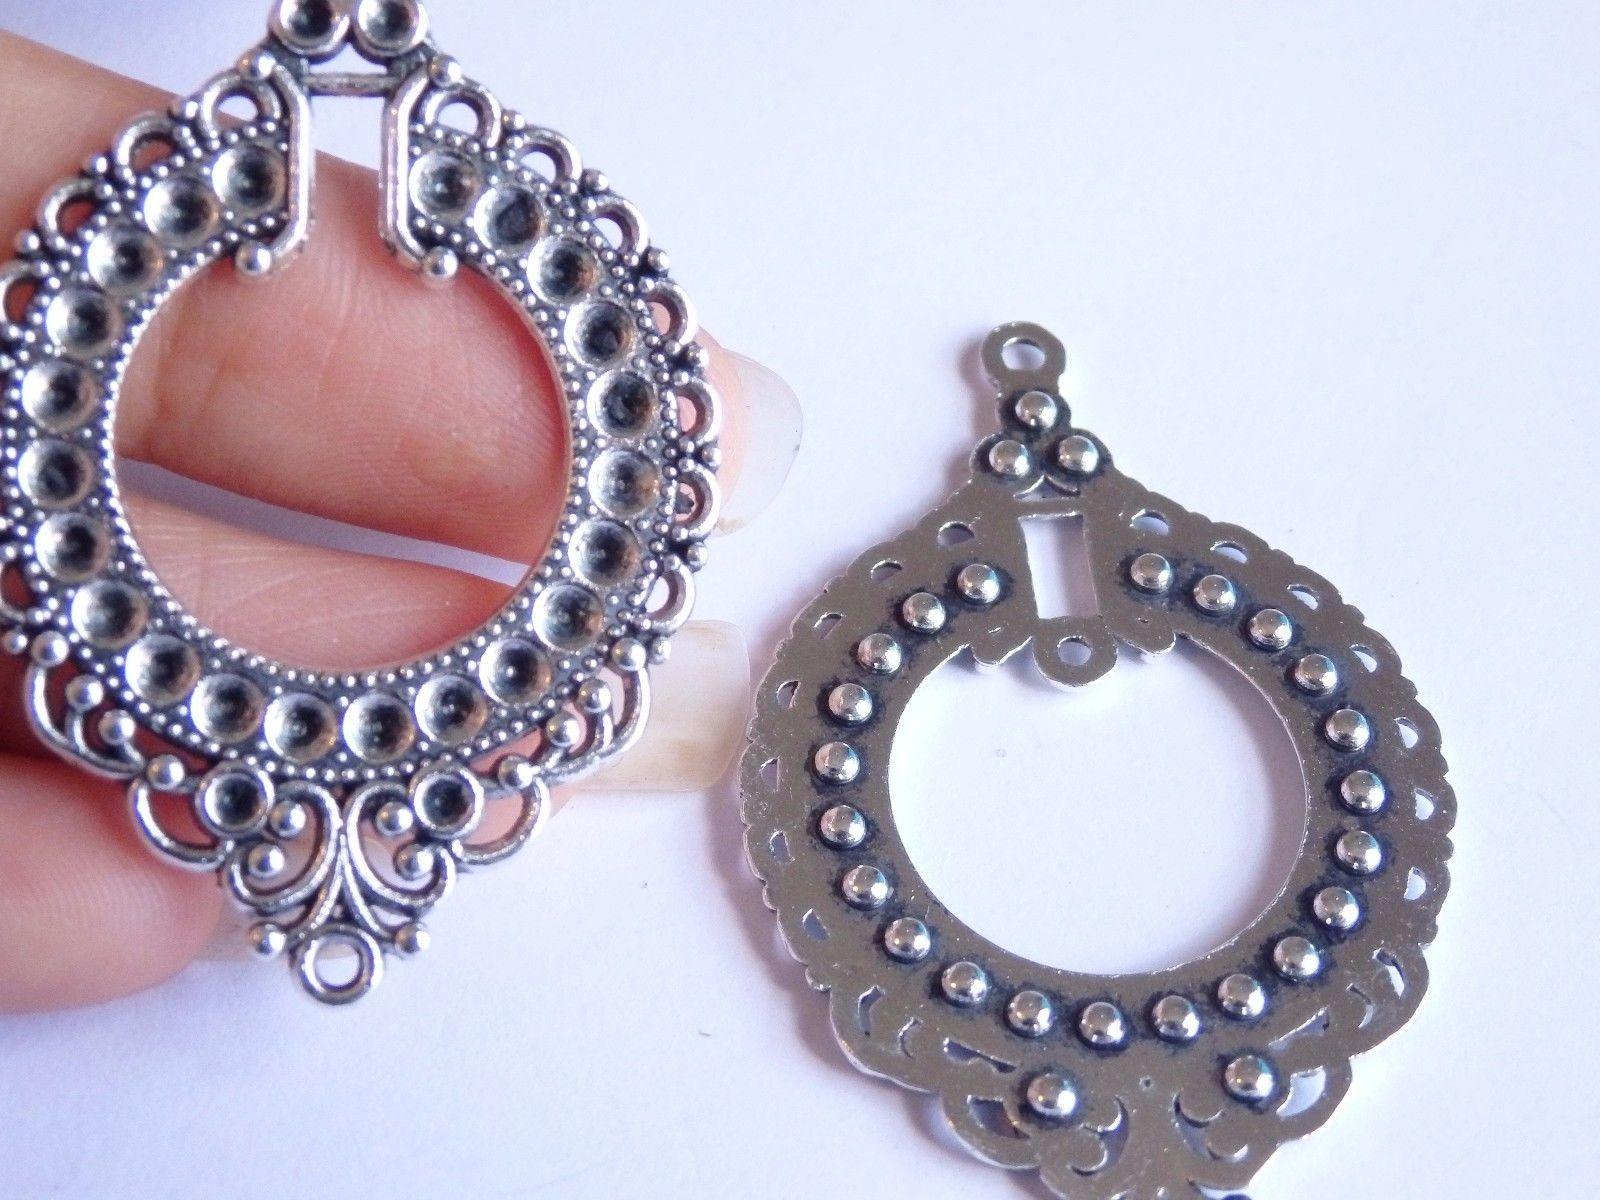 1 58 Gbp 10 Large Charms Pendants Tibetan Silver Jewellery Making